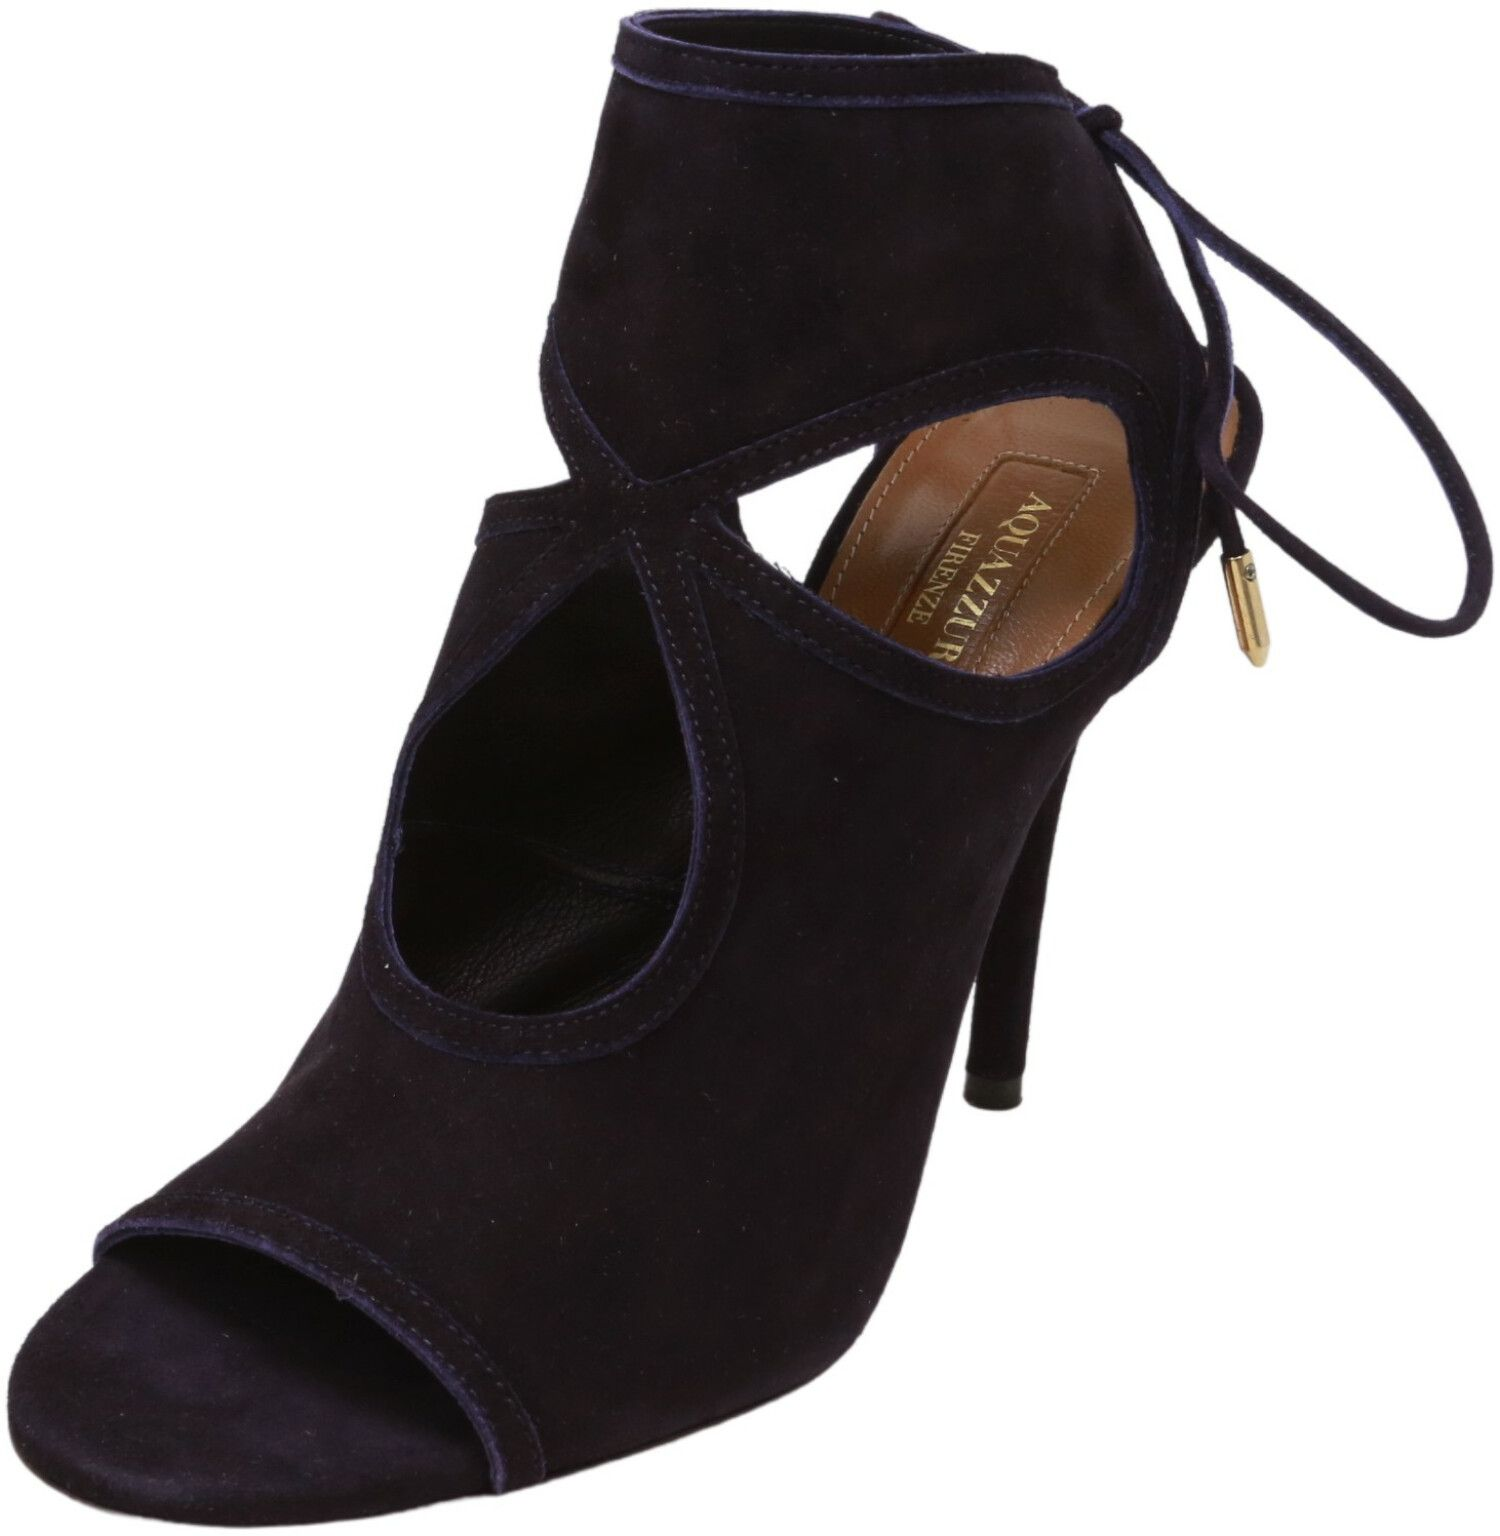 Aquazurra Firenze Women's Sexy Thing 105 Suede Sandal High-Top Leather Pump